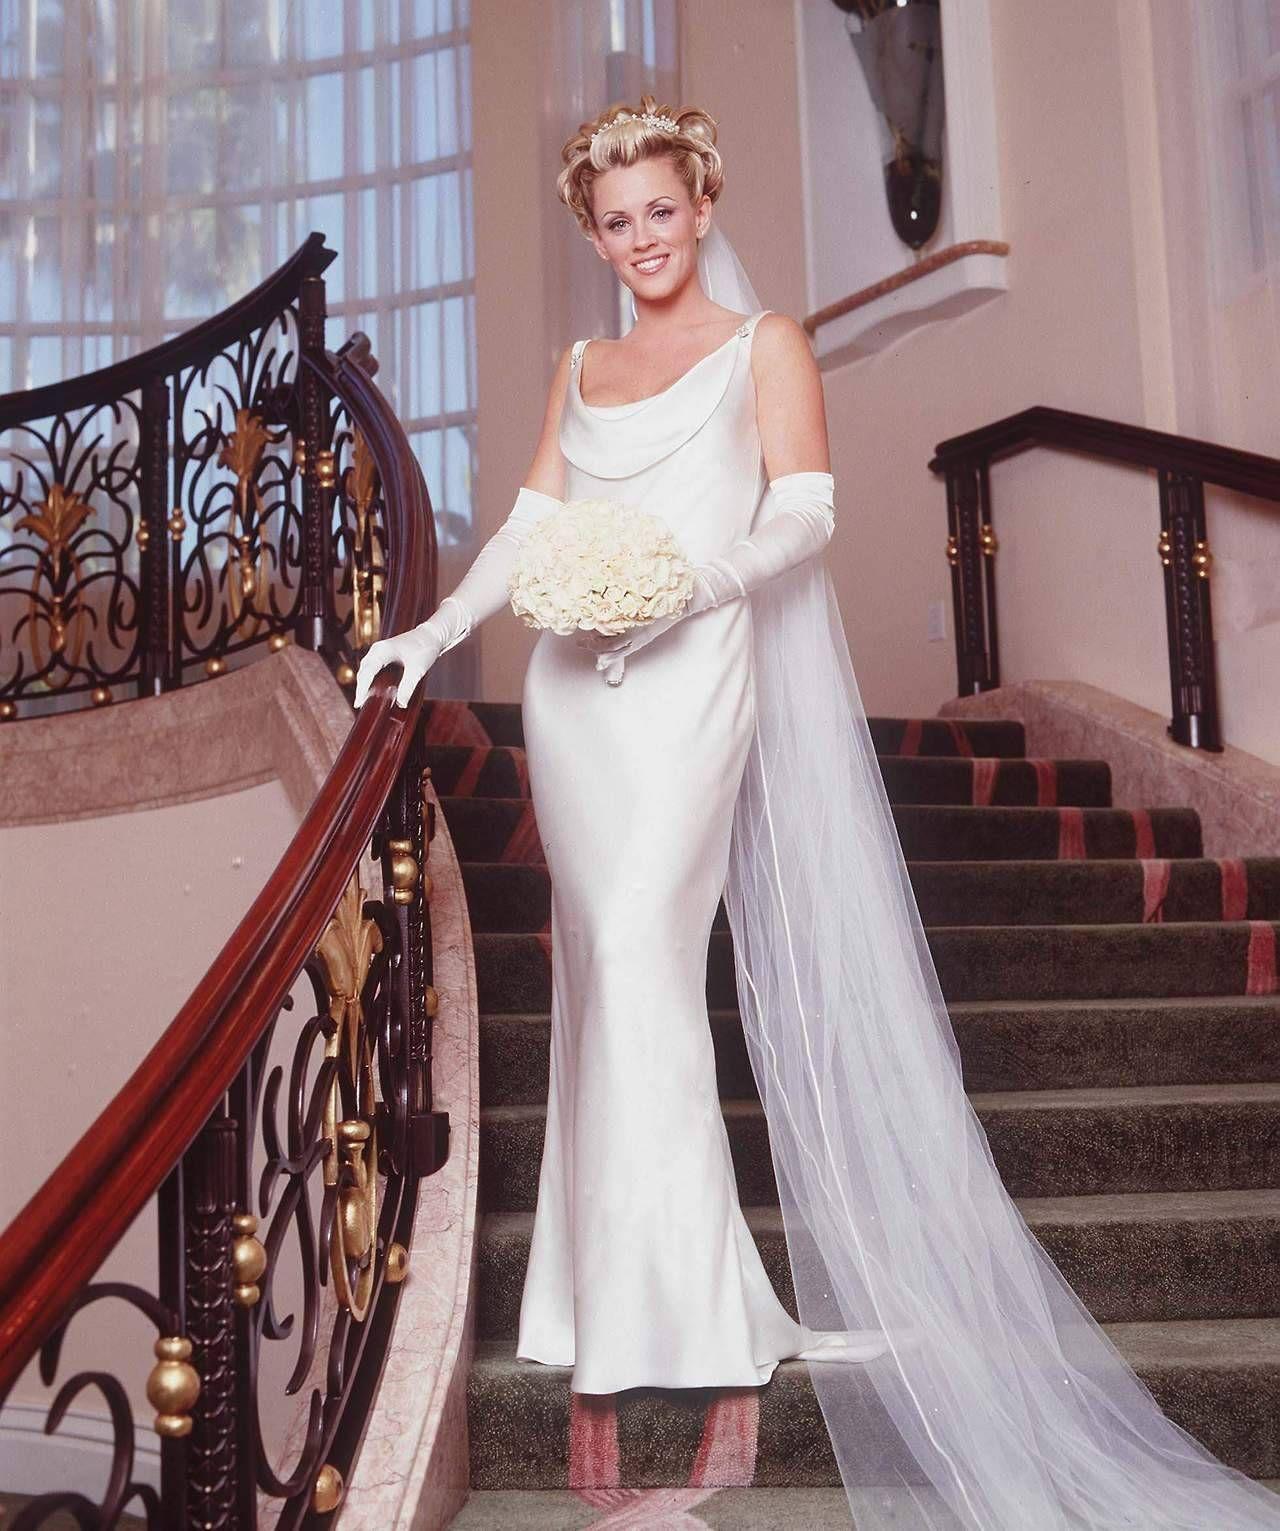 Jenny Mccarthy Wearing Opera Gloves Wedding Dresses Opera Gloves Dresses